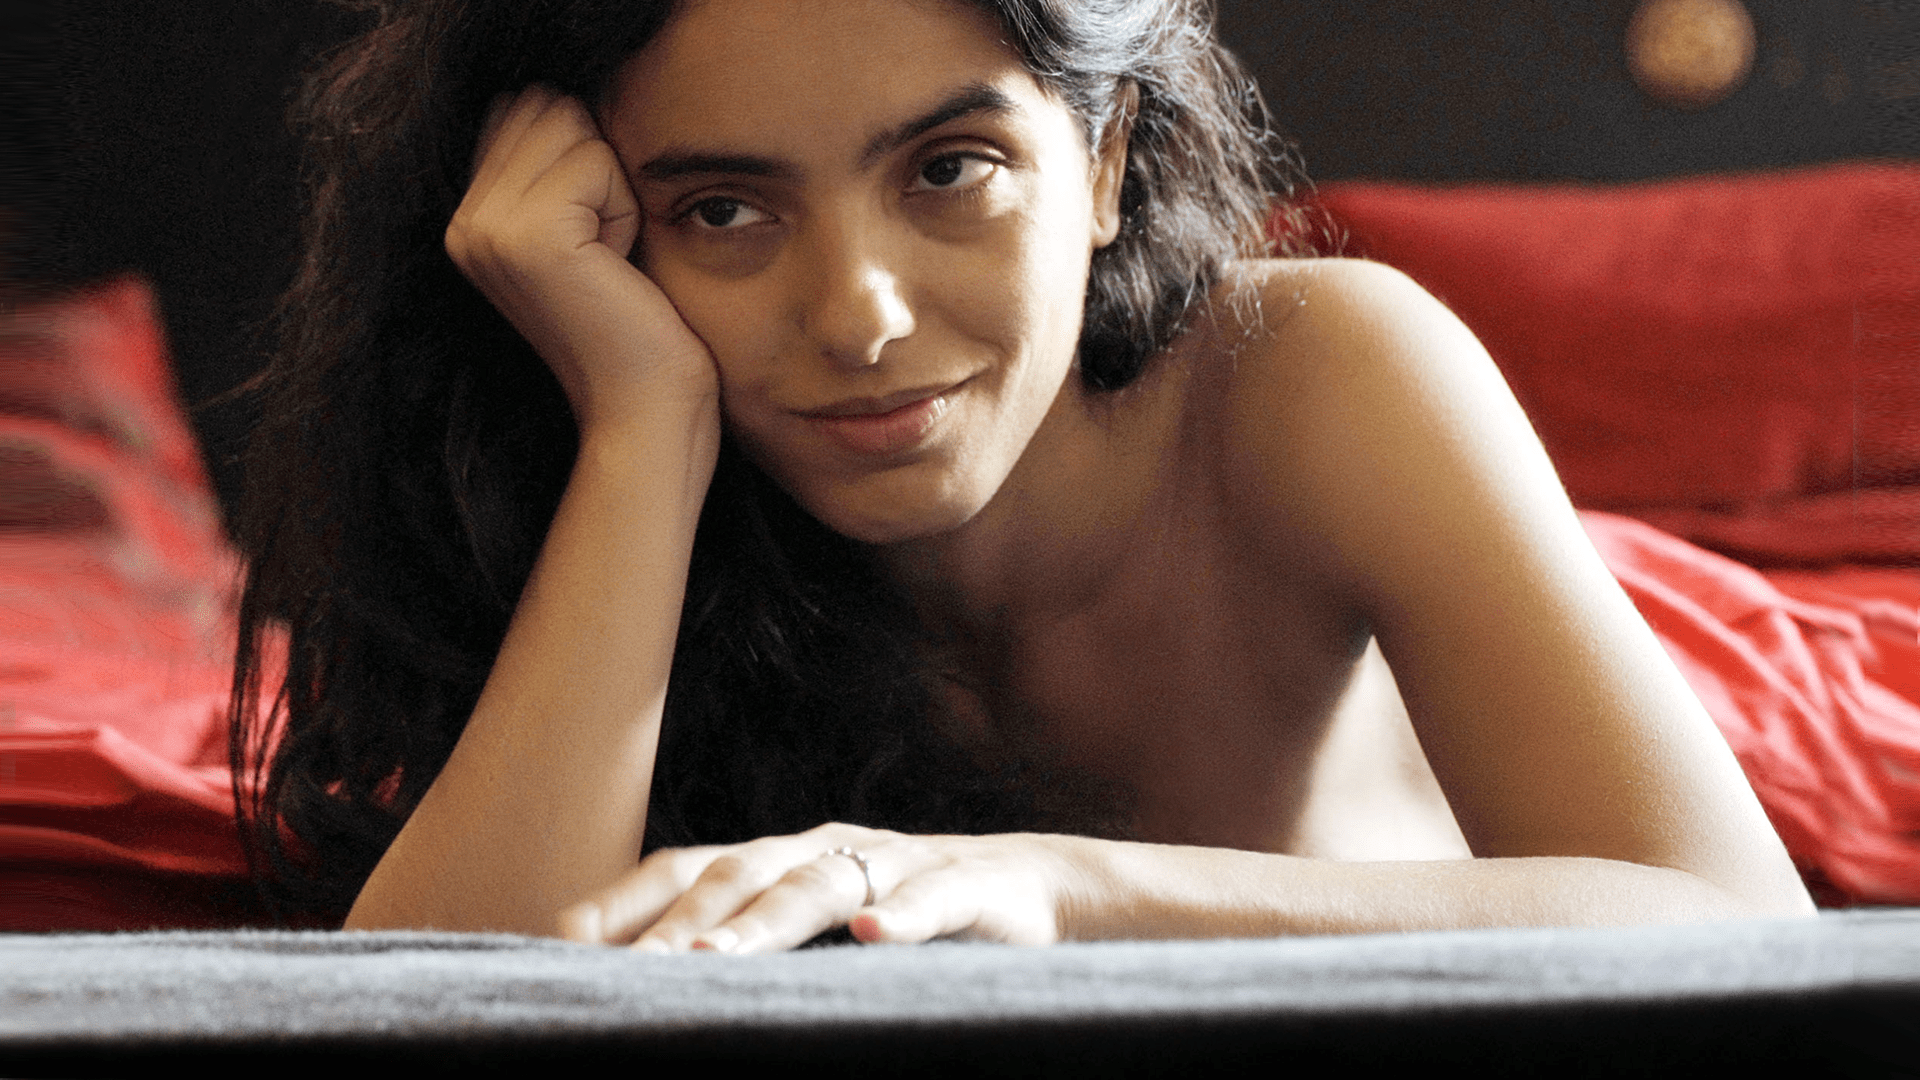 Les variations amoureuses d'Hafsia Herzi